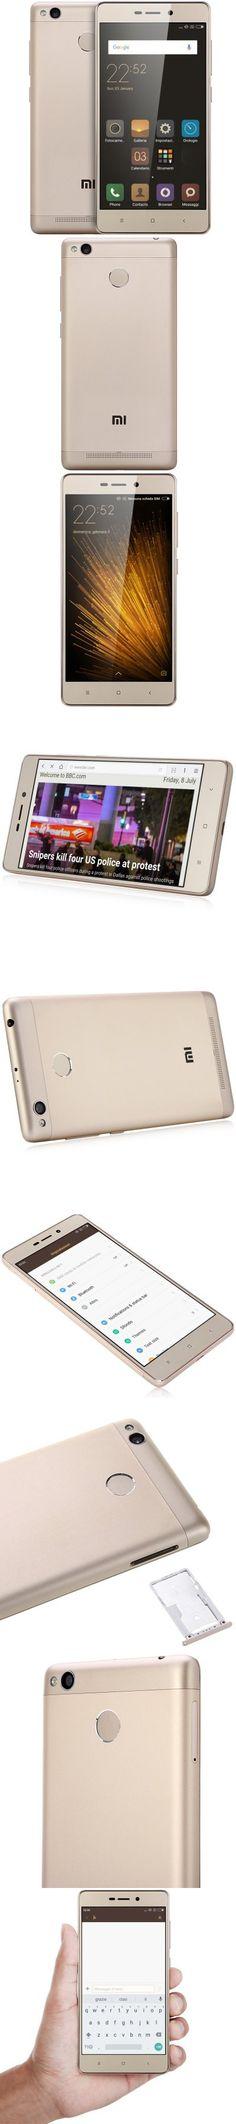 Xiaomi Redmi 3S 16GB ROM 4G Smartphone GLOBAL VERSION + UK PLUG-$153.14